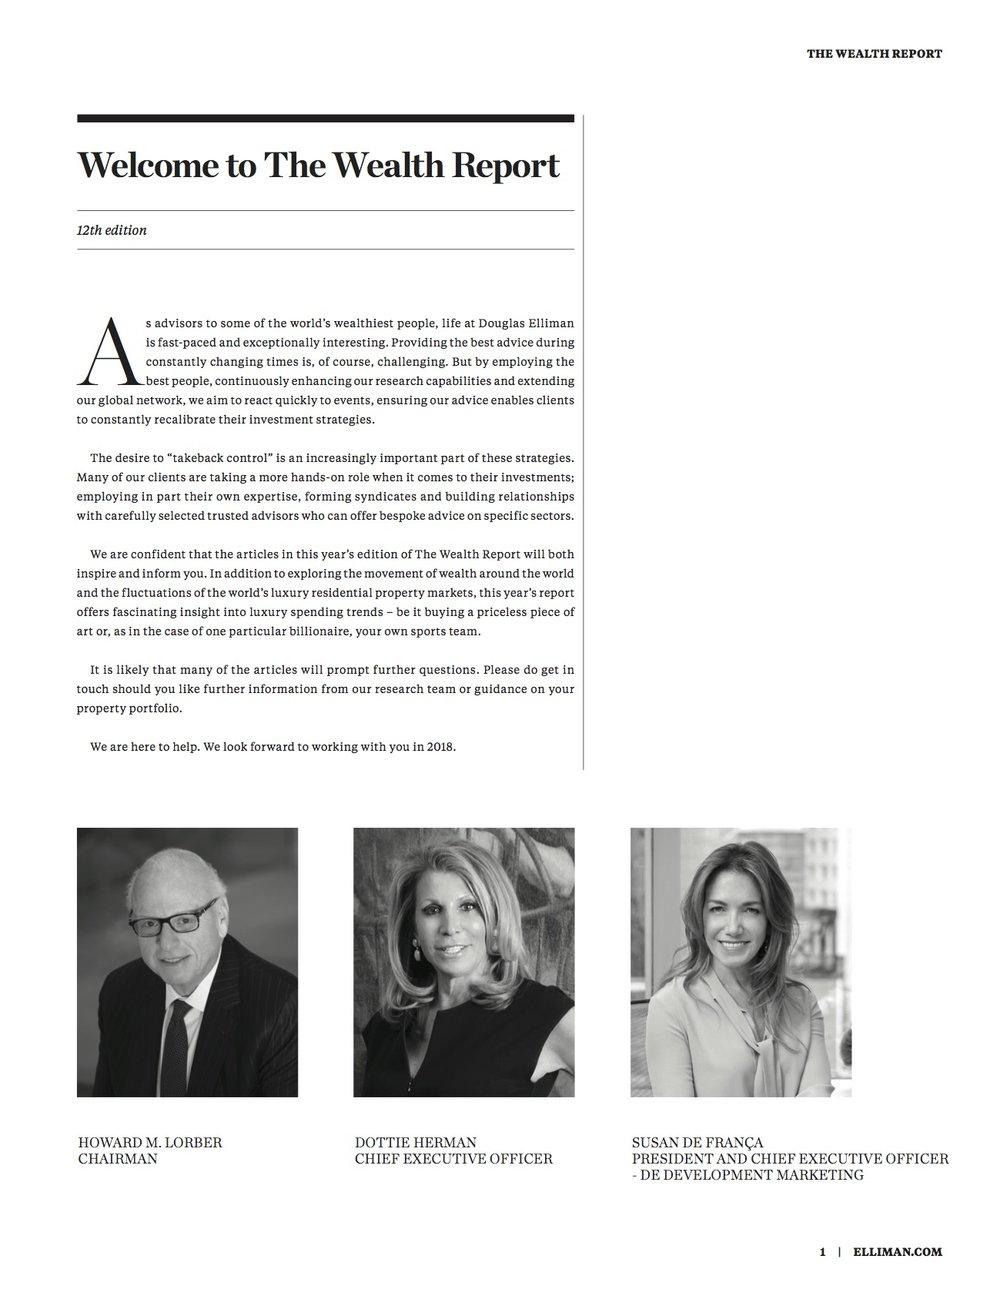 2018 Wealth Report3.jpg